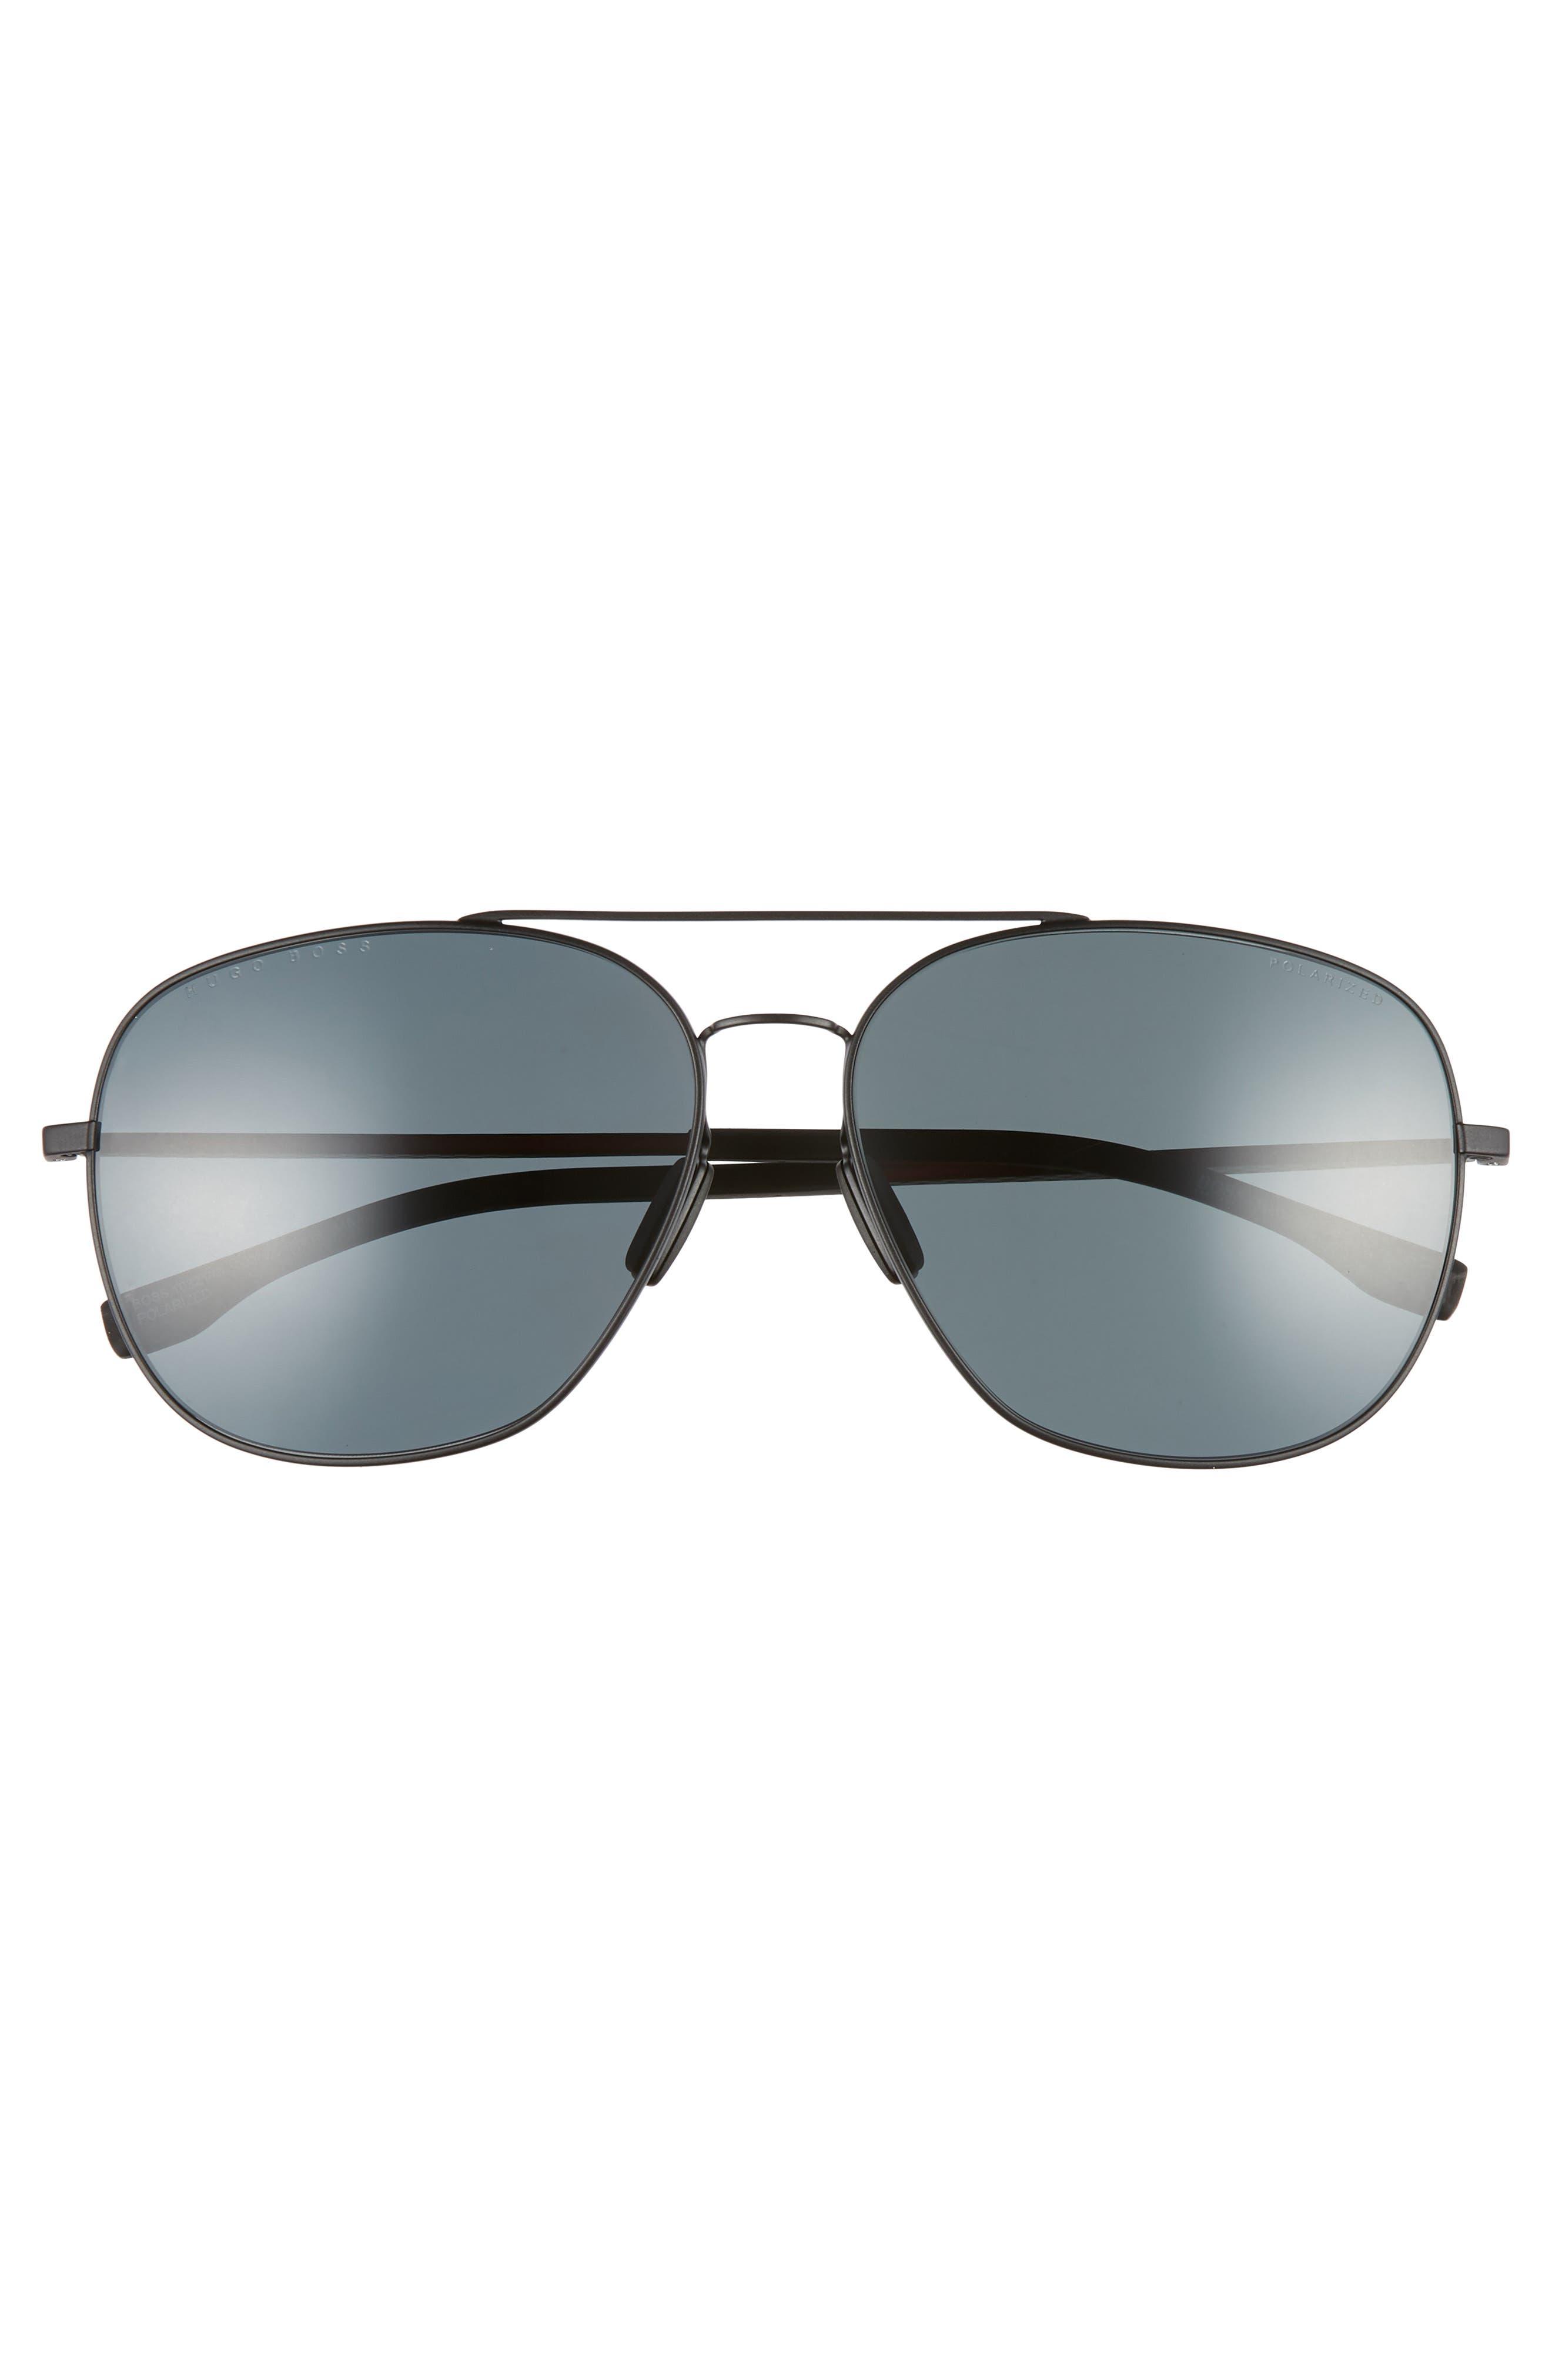 62mm Polarized Special Fit Aviator Sunglasses,                             Alternate thumbnail 2, color,                             MATTE BLACK